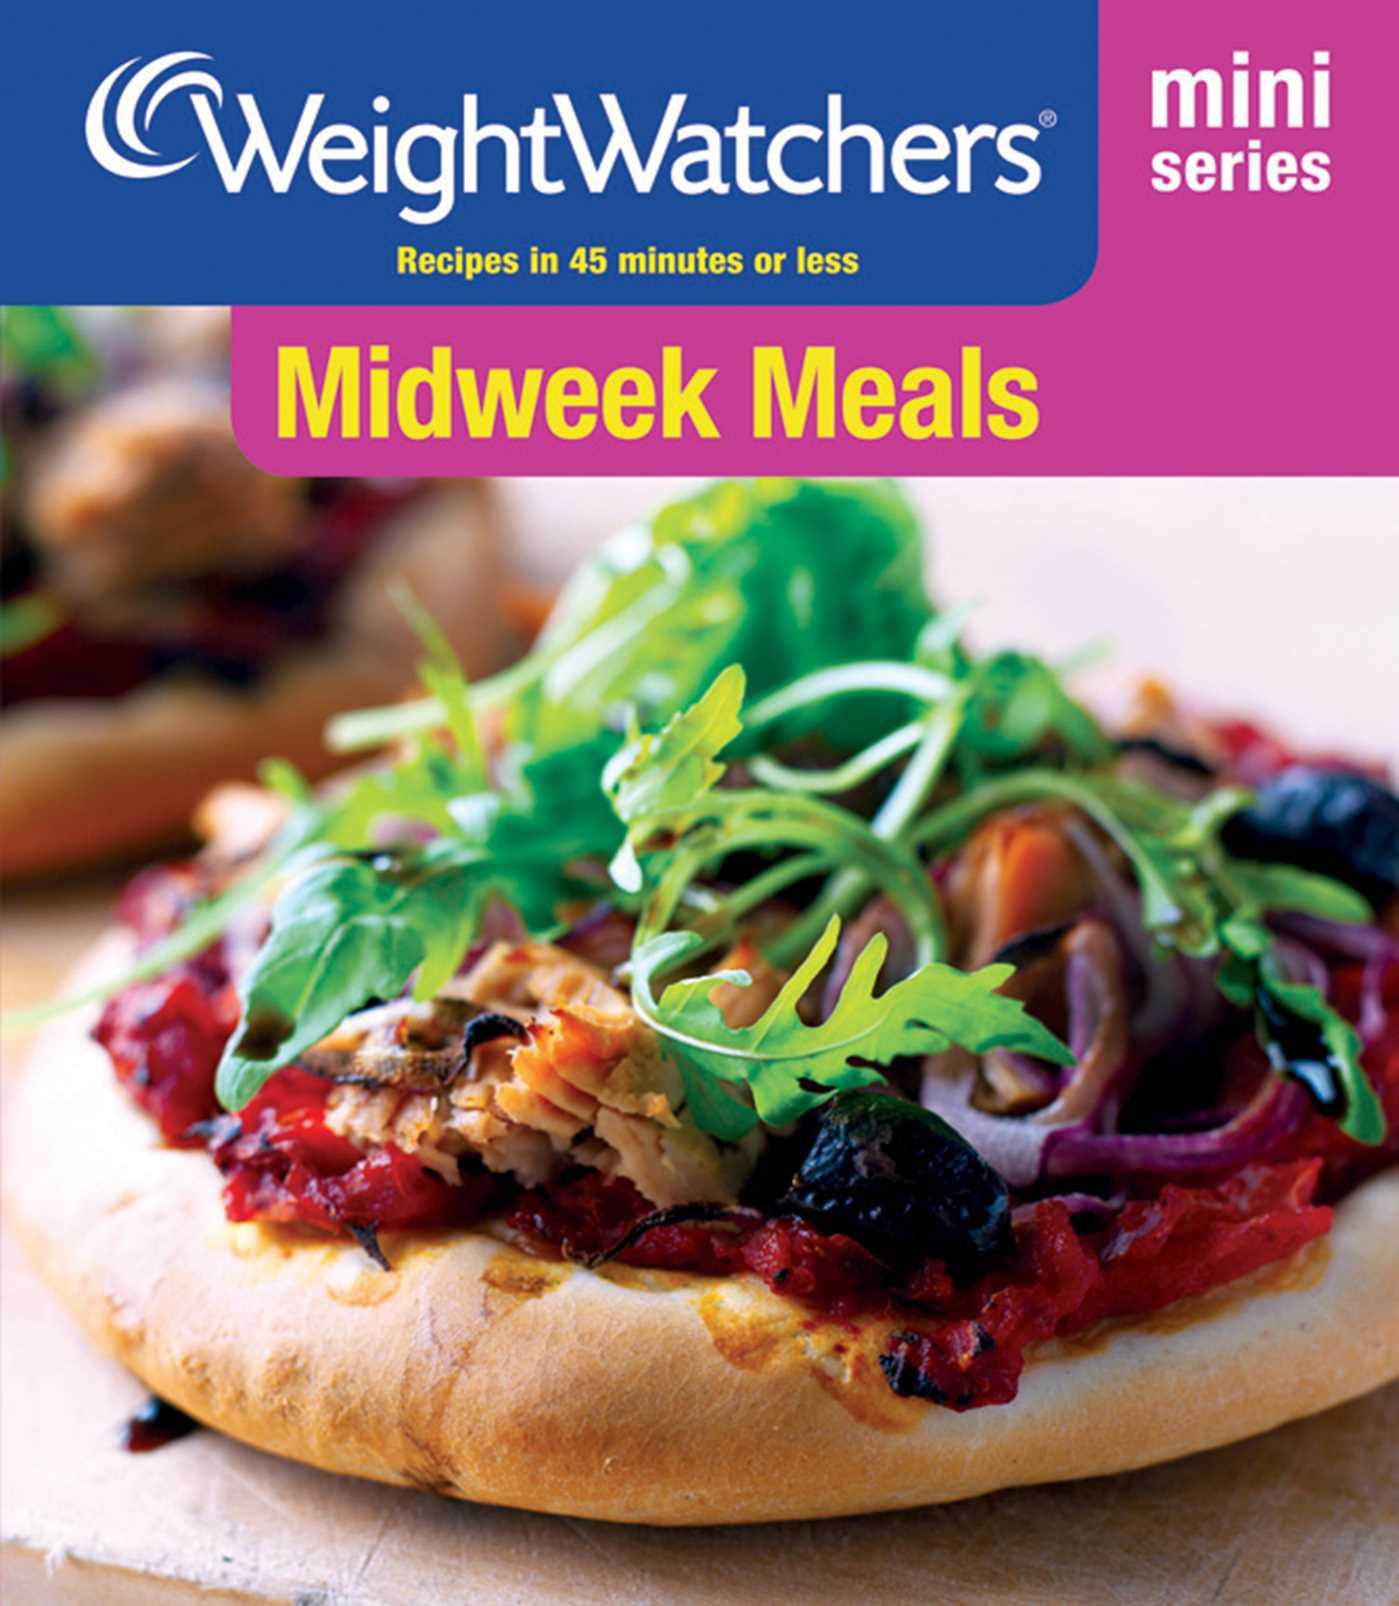 Weight watchers mini series midweek meals 9781471151330 hr